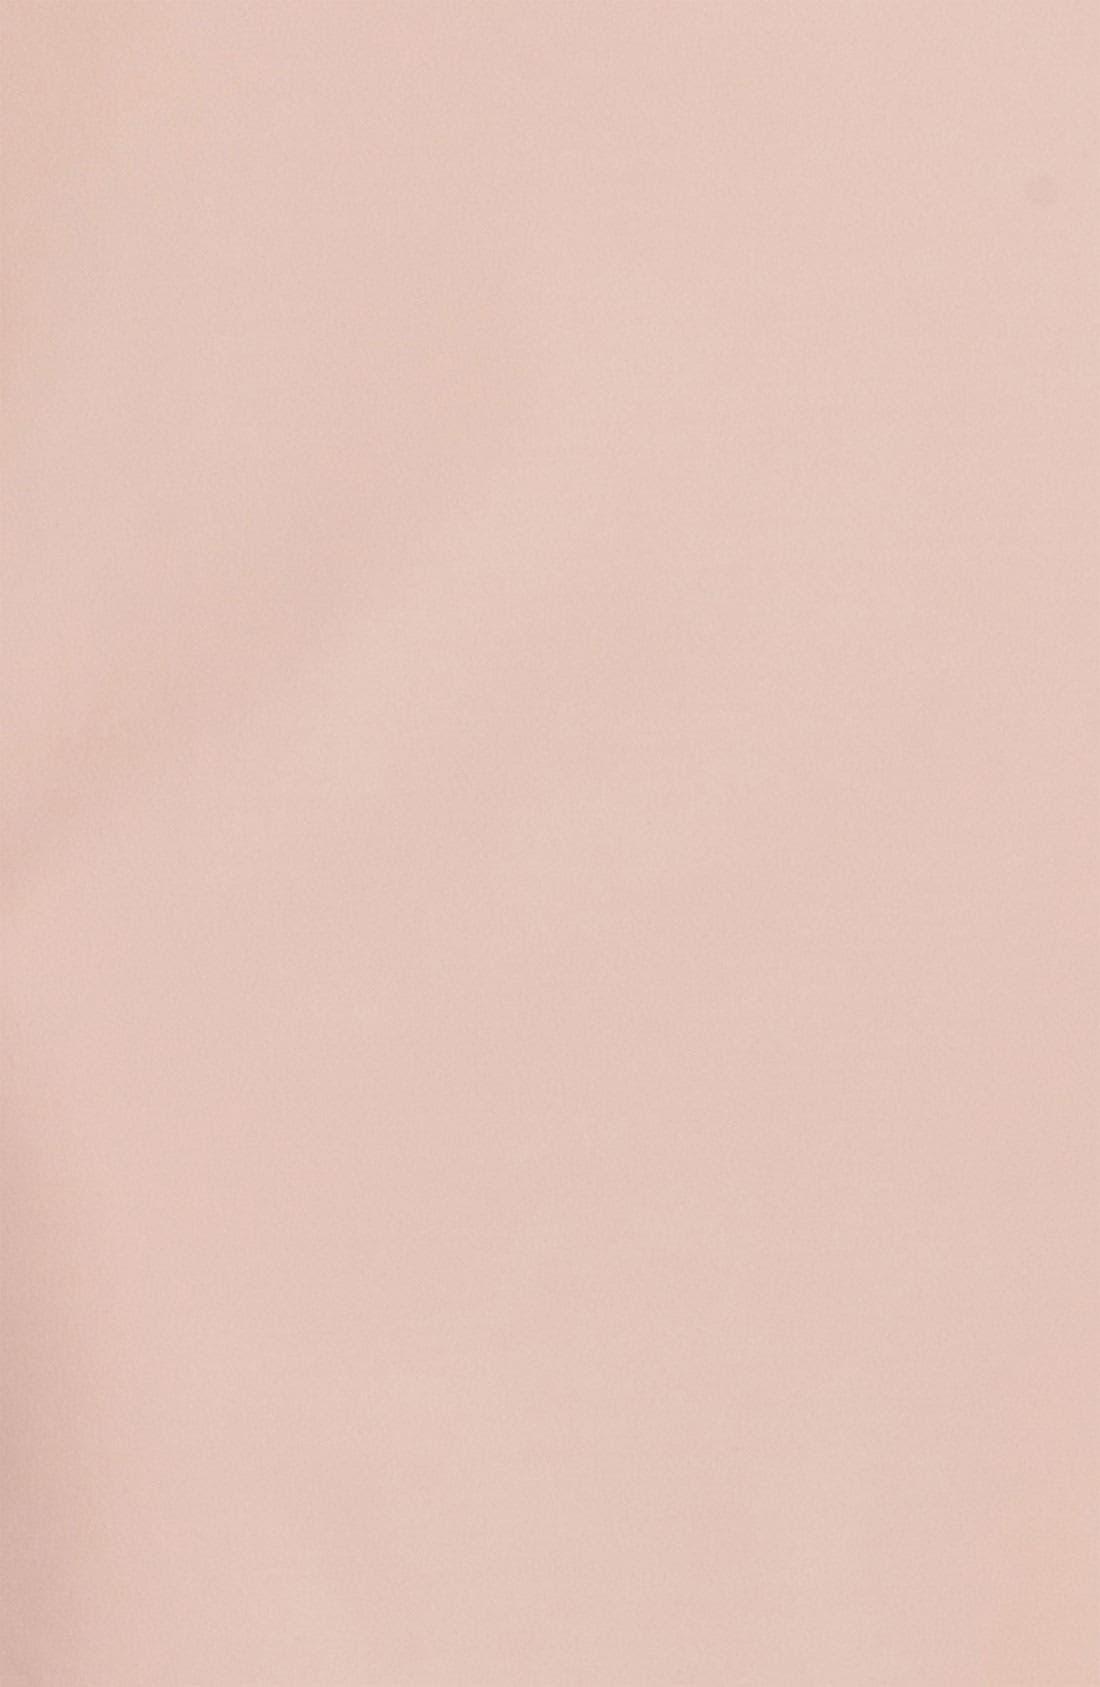 Strapless Slip,                         Main,                         color, 250